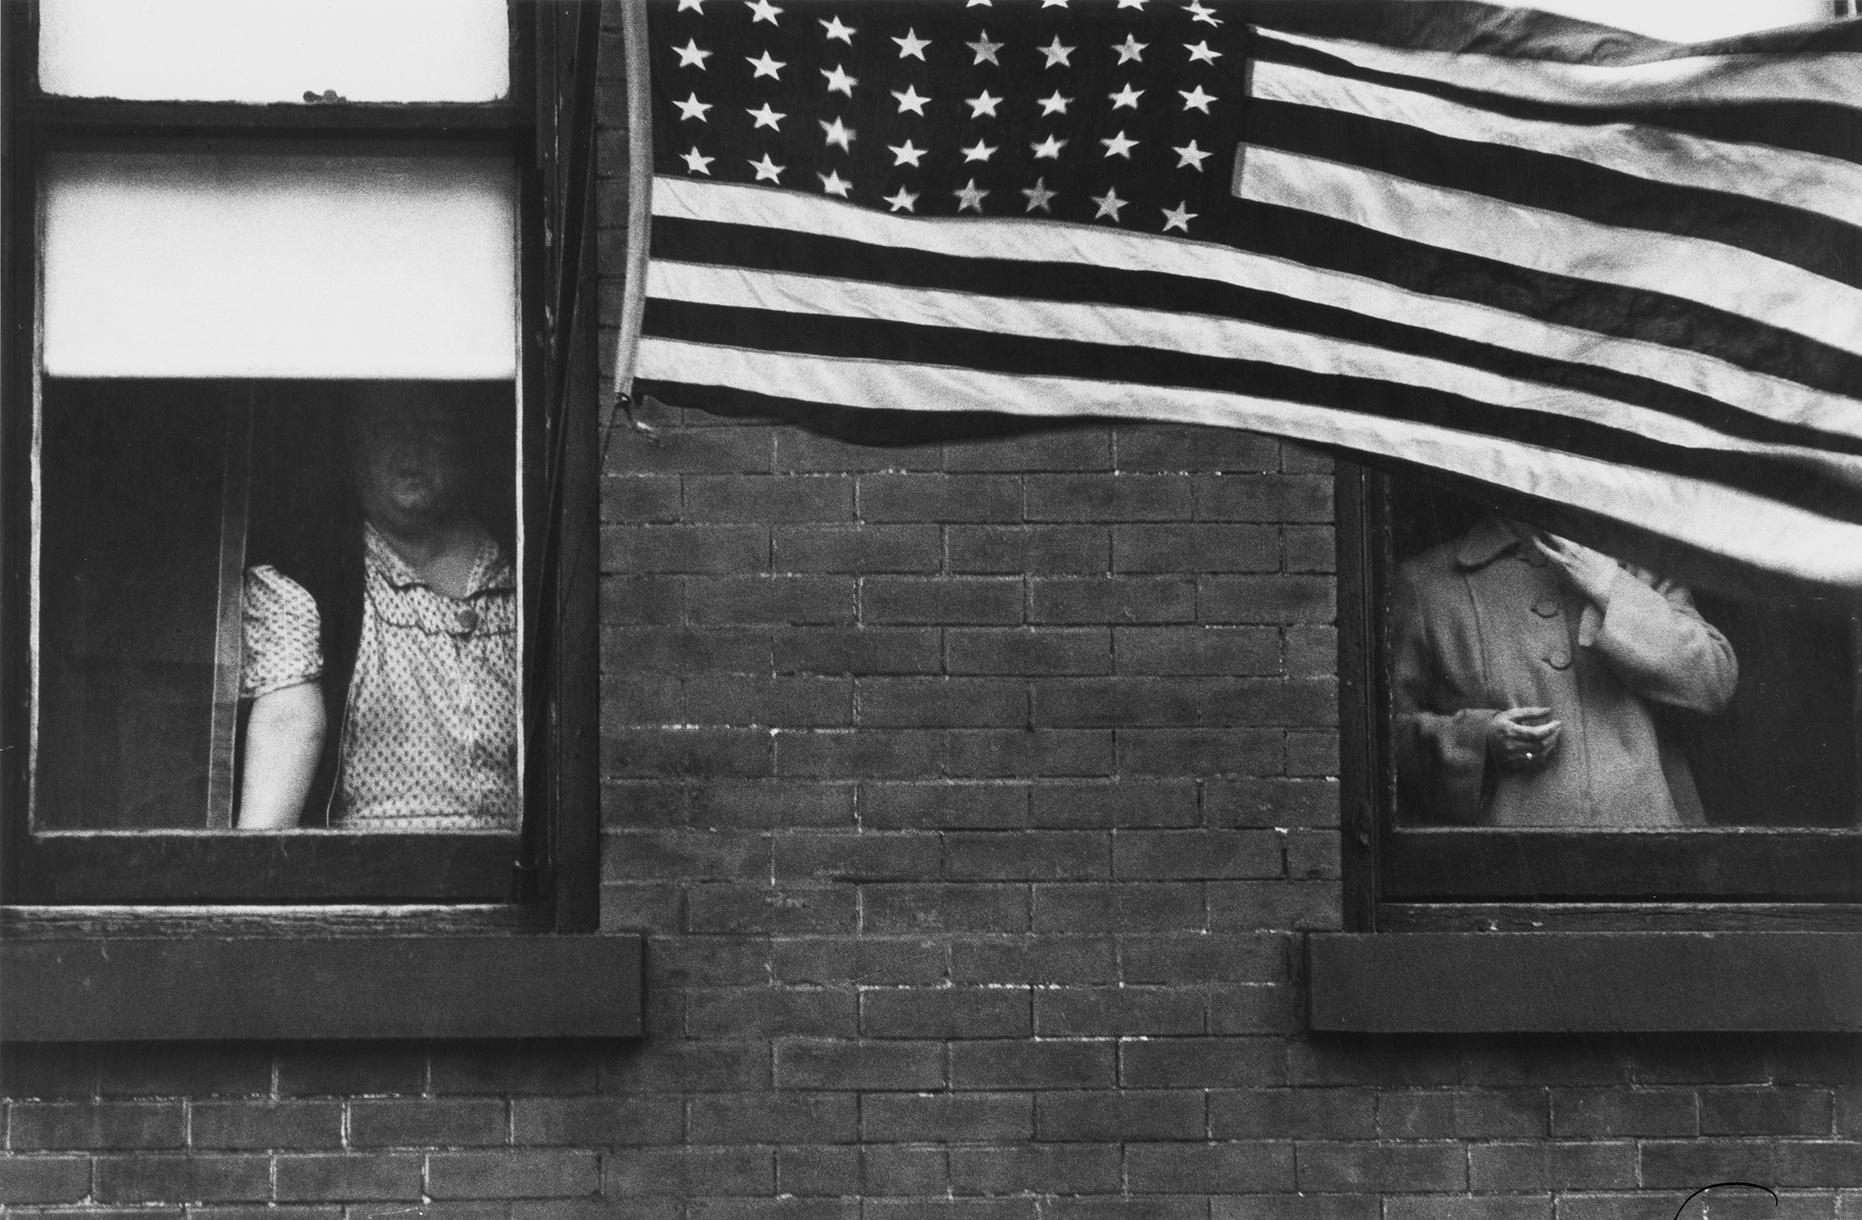 Robert Frank, Parade, Hoboken, New Jersey, 1955, gelatin silver print